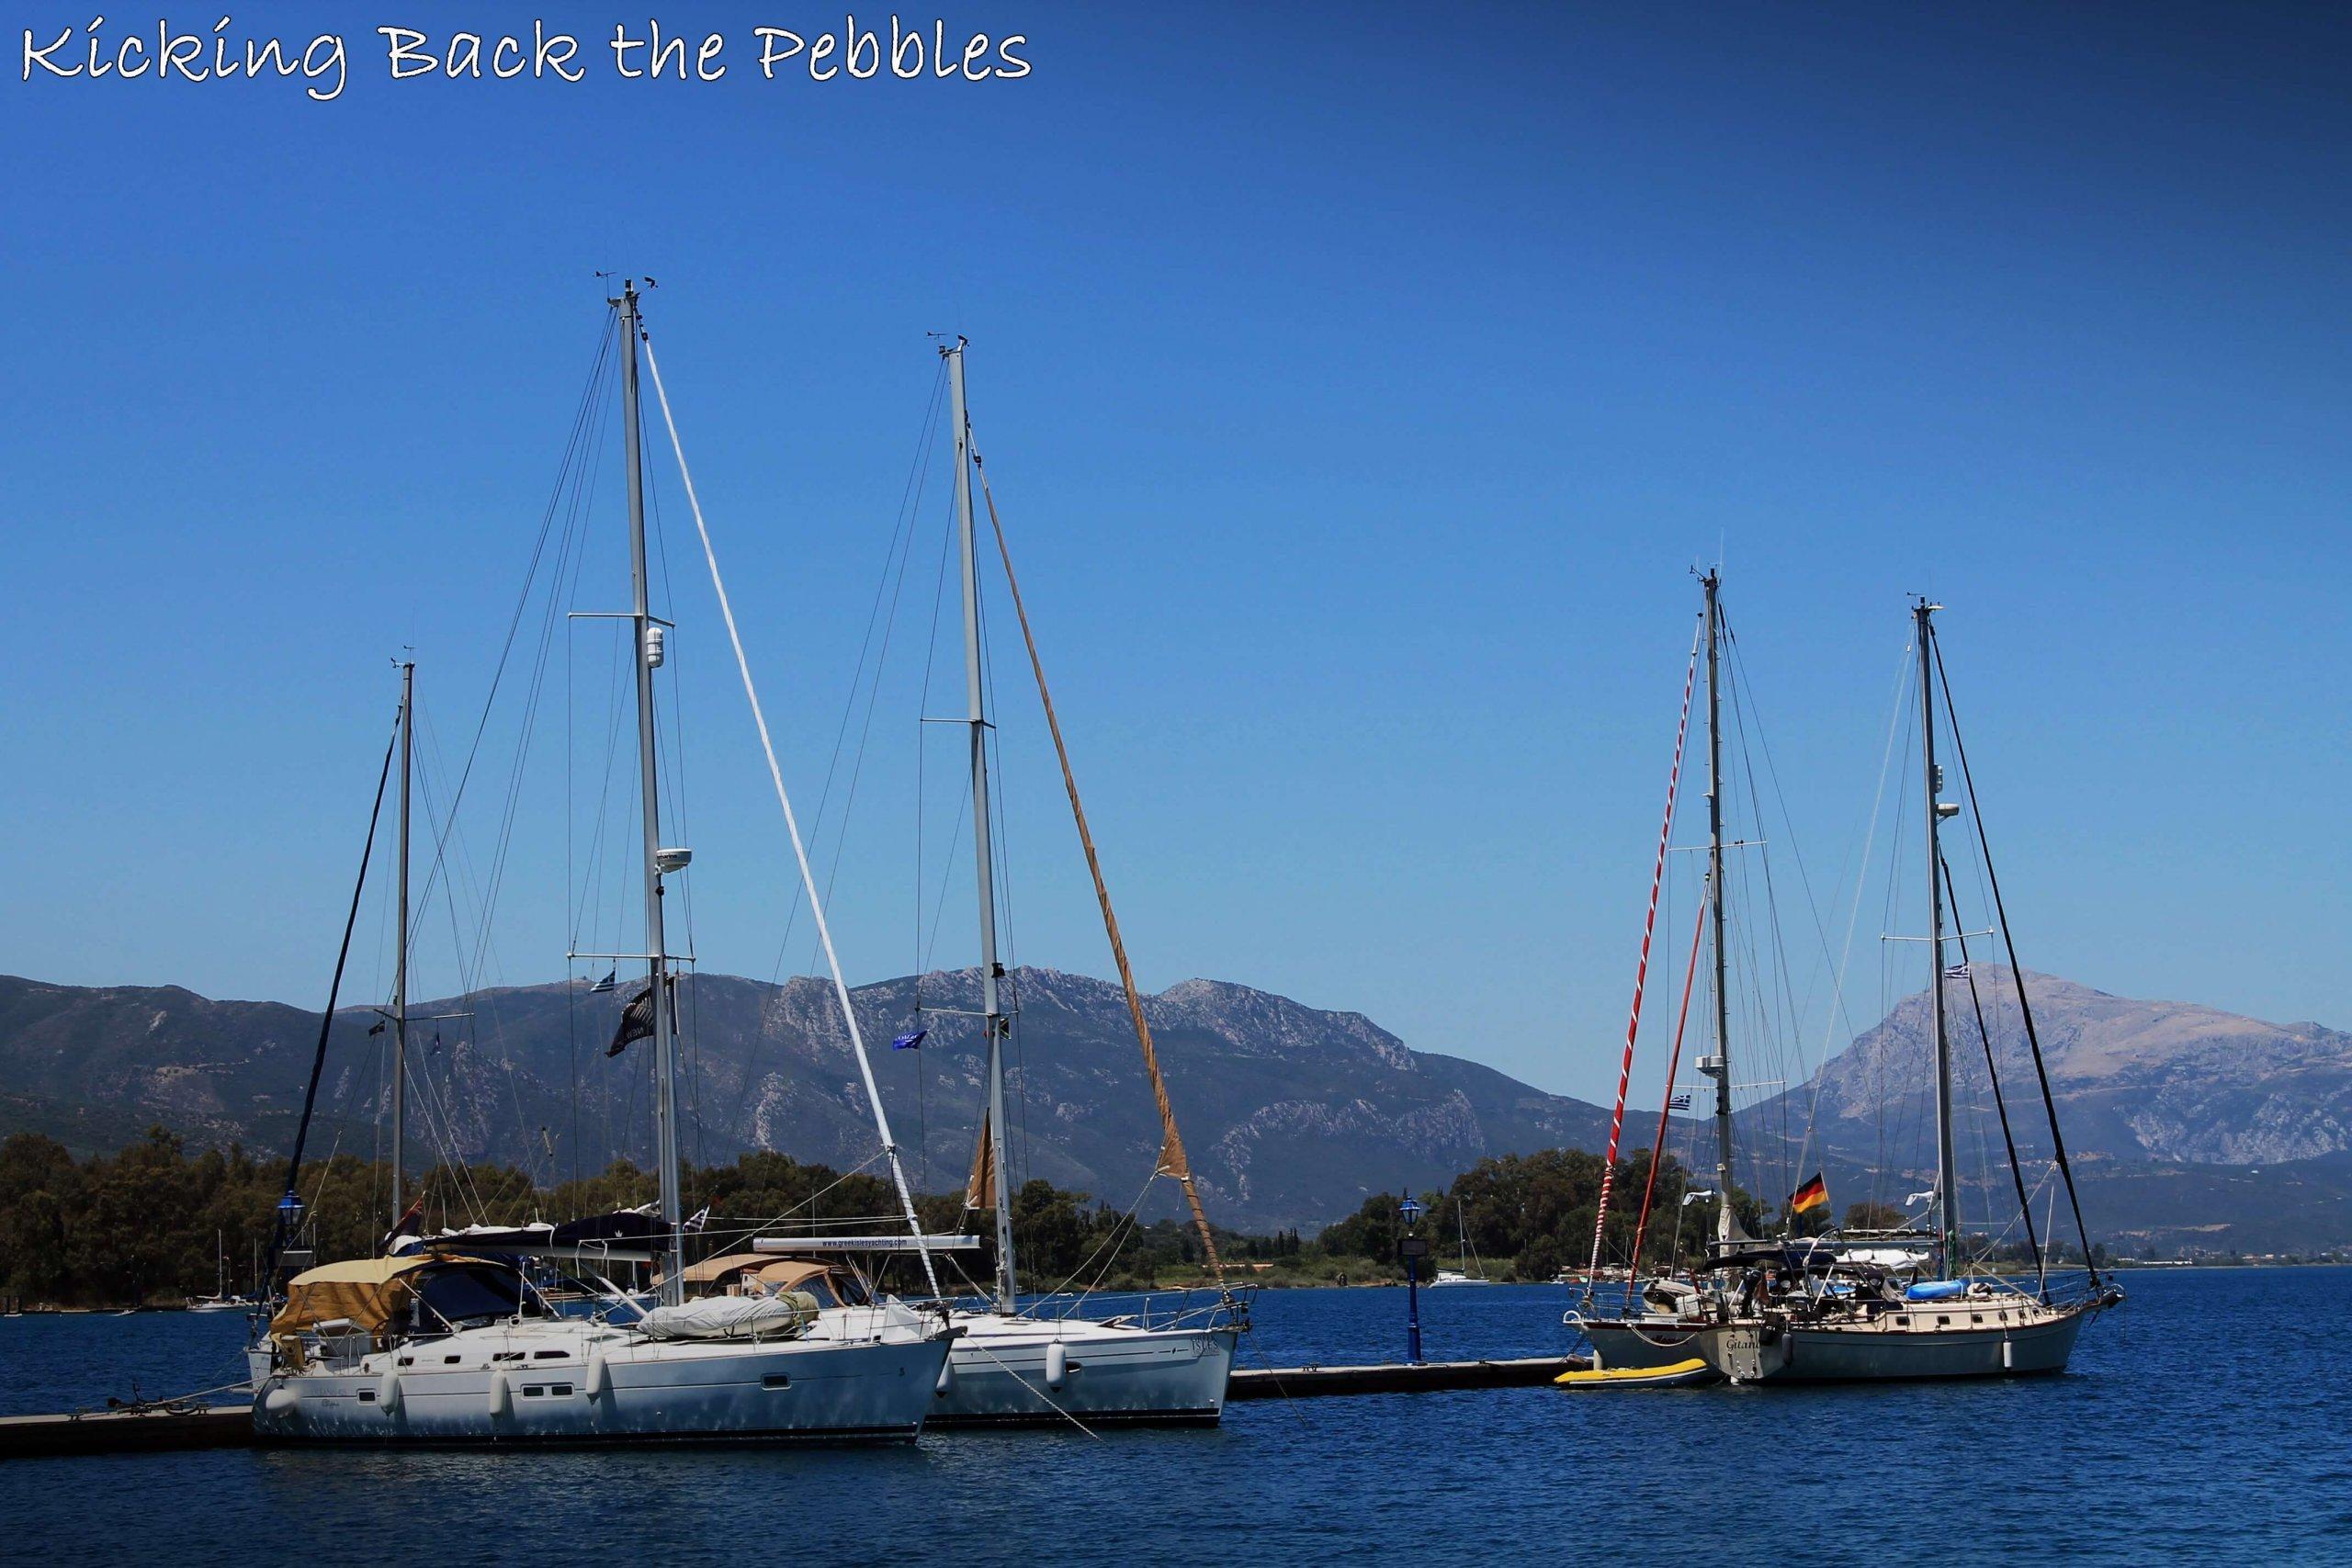 Poros Island | Kicking Back the Pebbles